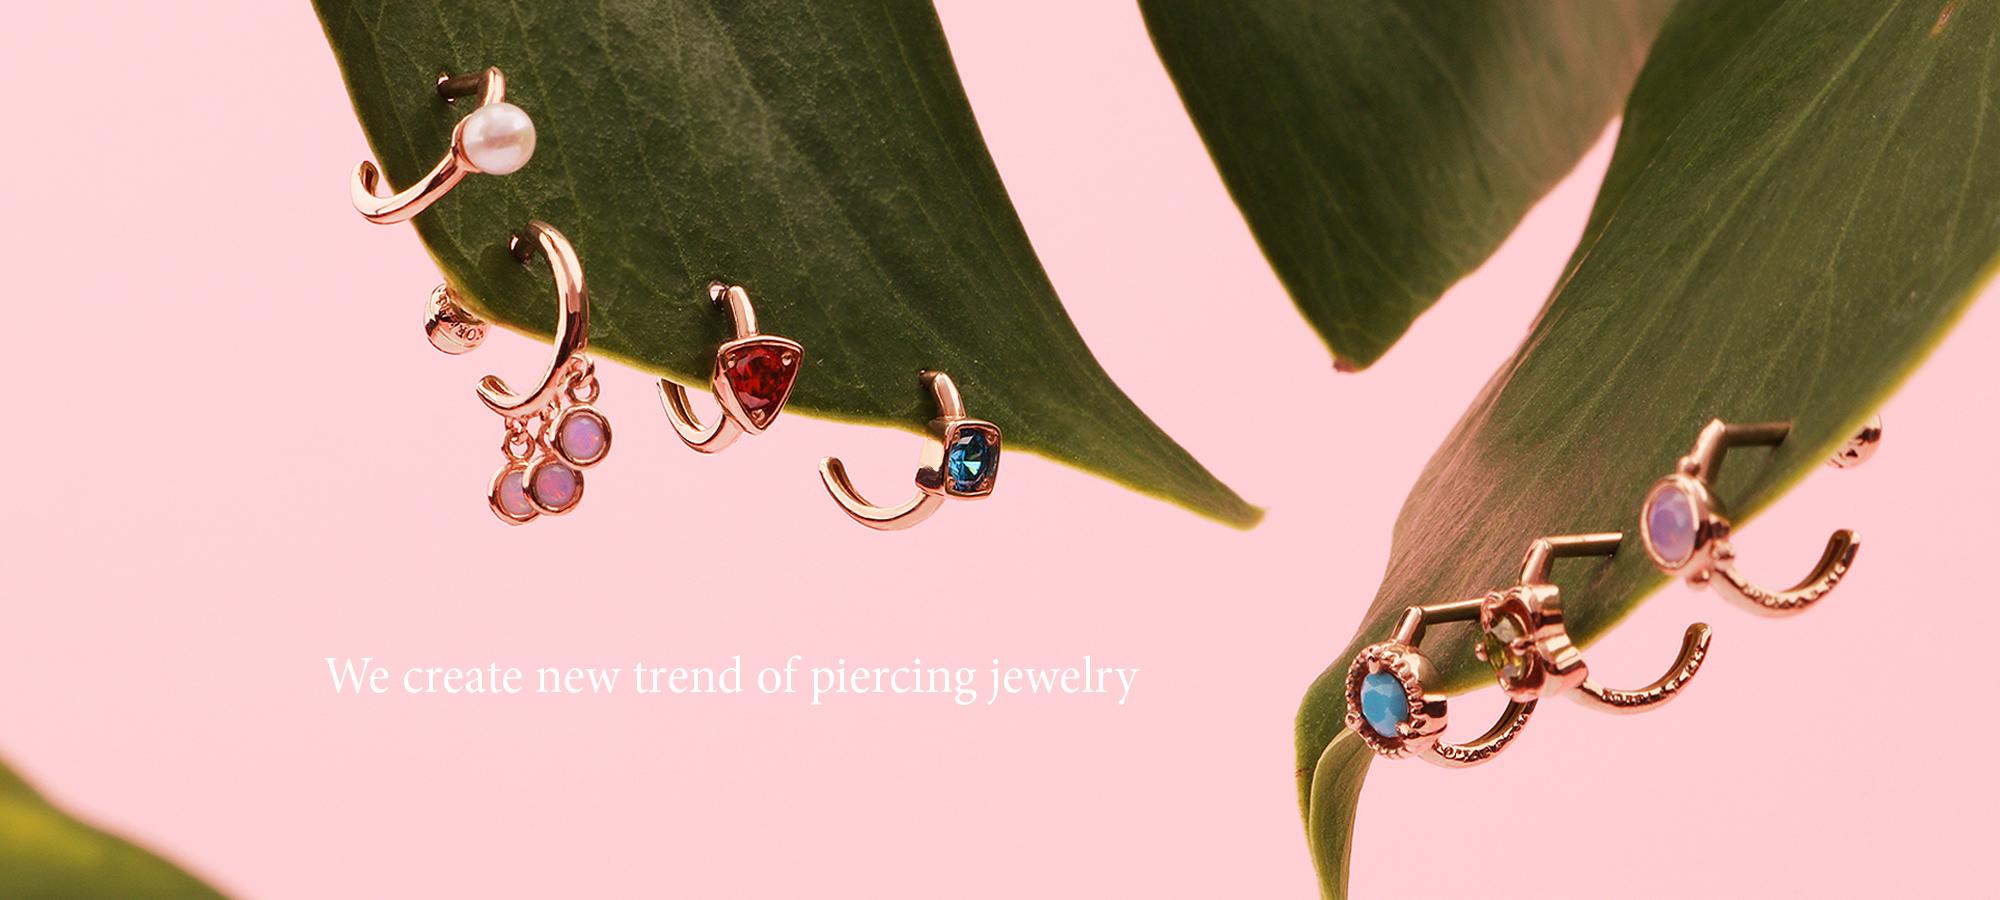 Korea Piercing Gold Body Piercing Jewelry Manufacturer